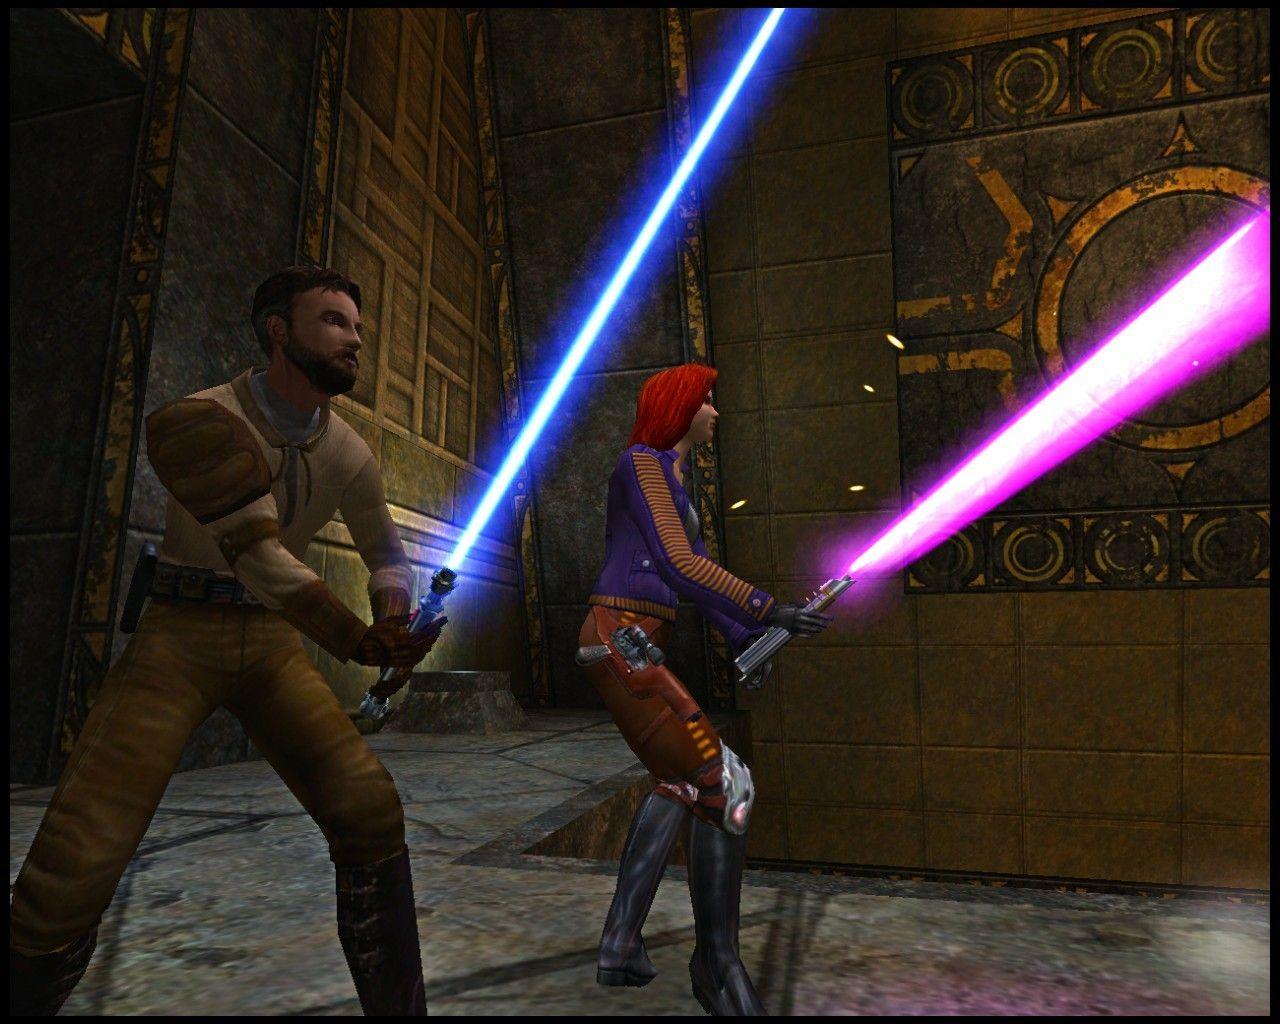 Mara Jade And Kyle Katarn In Star Wars Jedi Knight Ii Mysteries